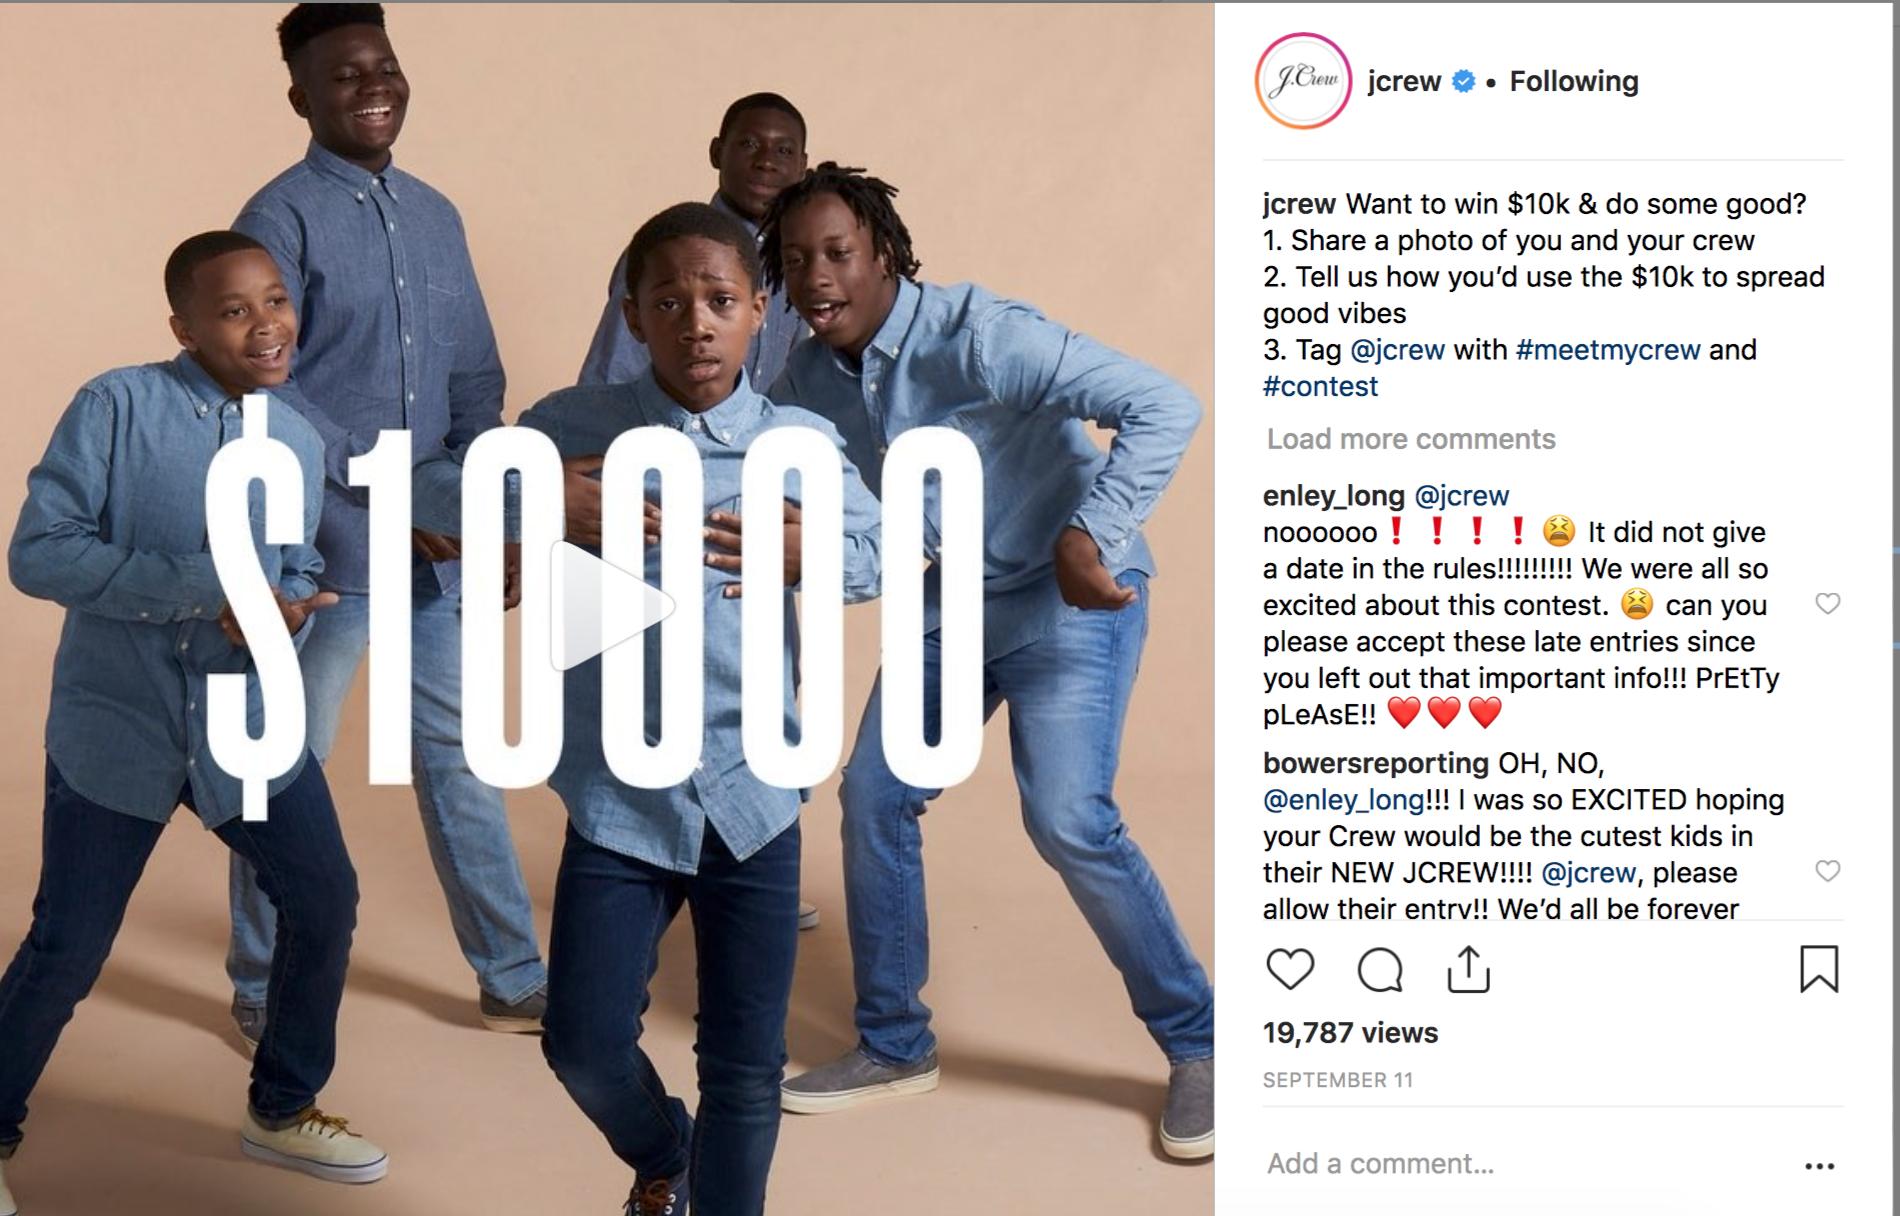 J. Crew Instagram Post 9/11/18